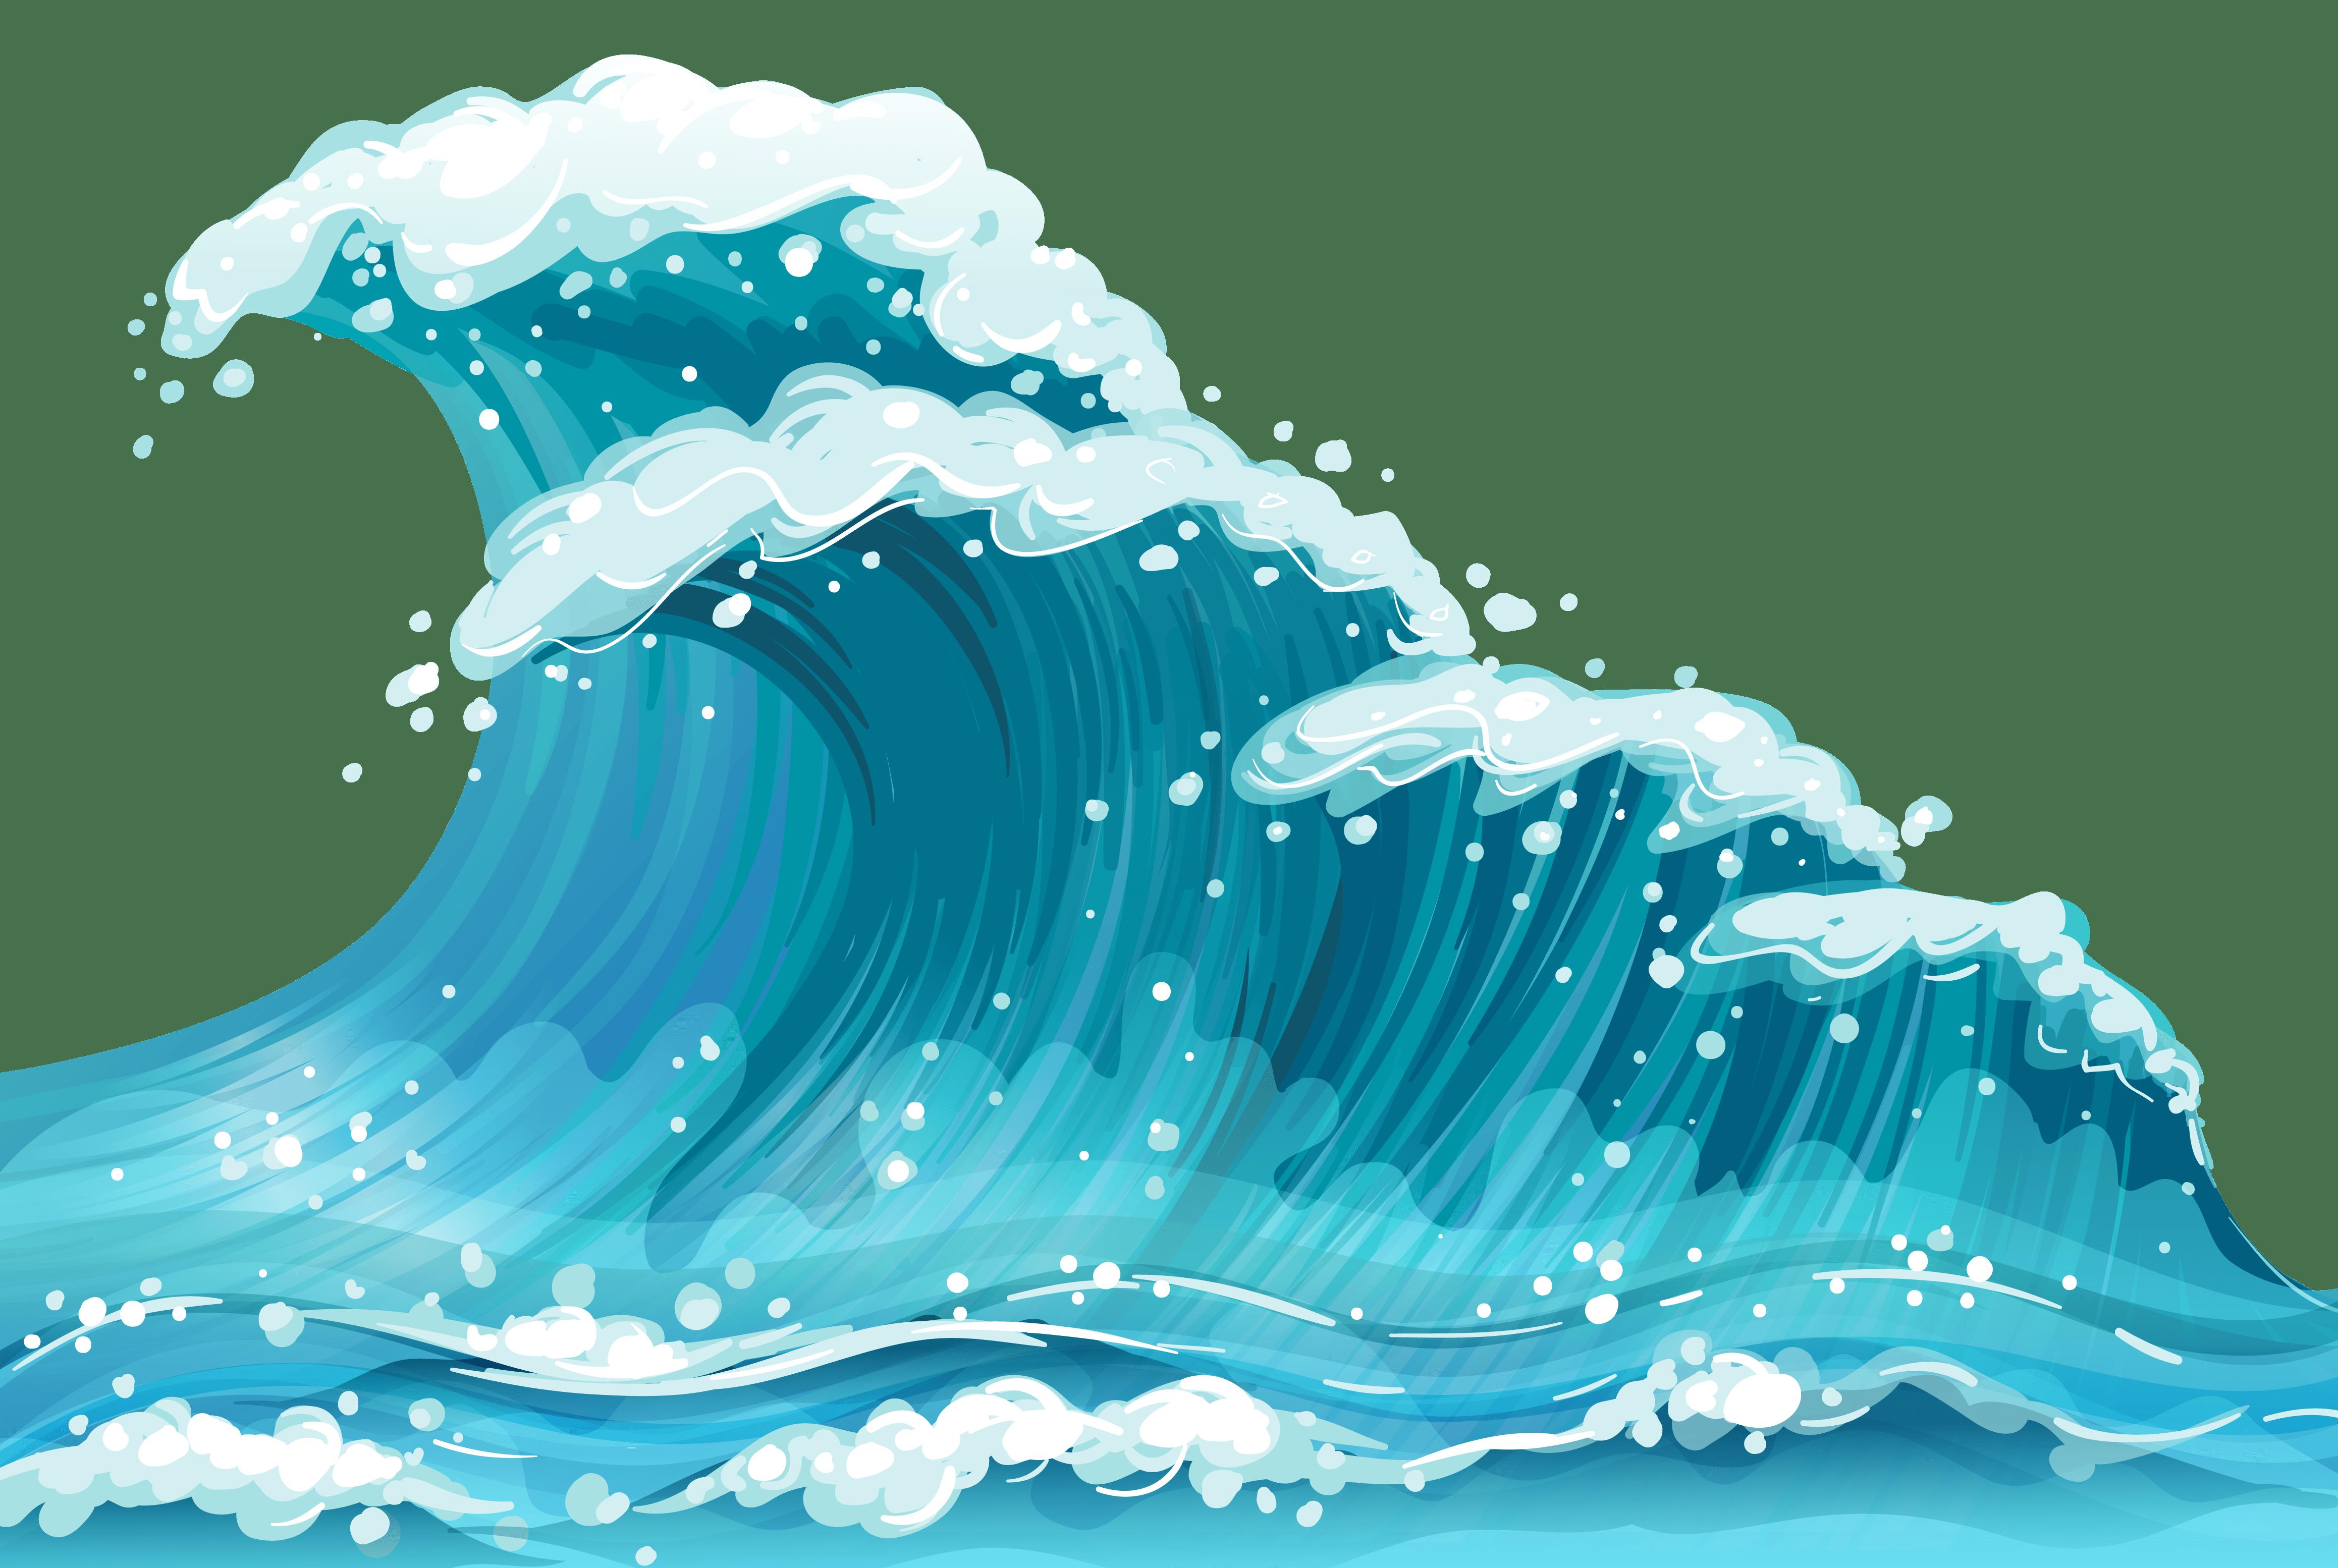 clipart waves transparent - Clipground (4633 x 3108 Pixel)